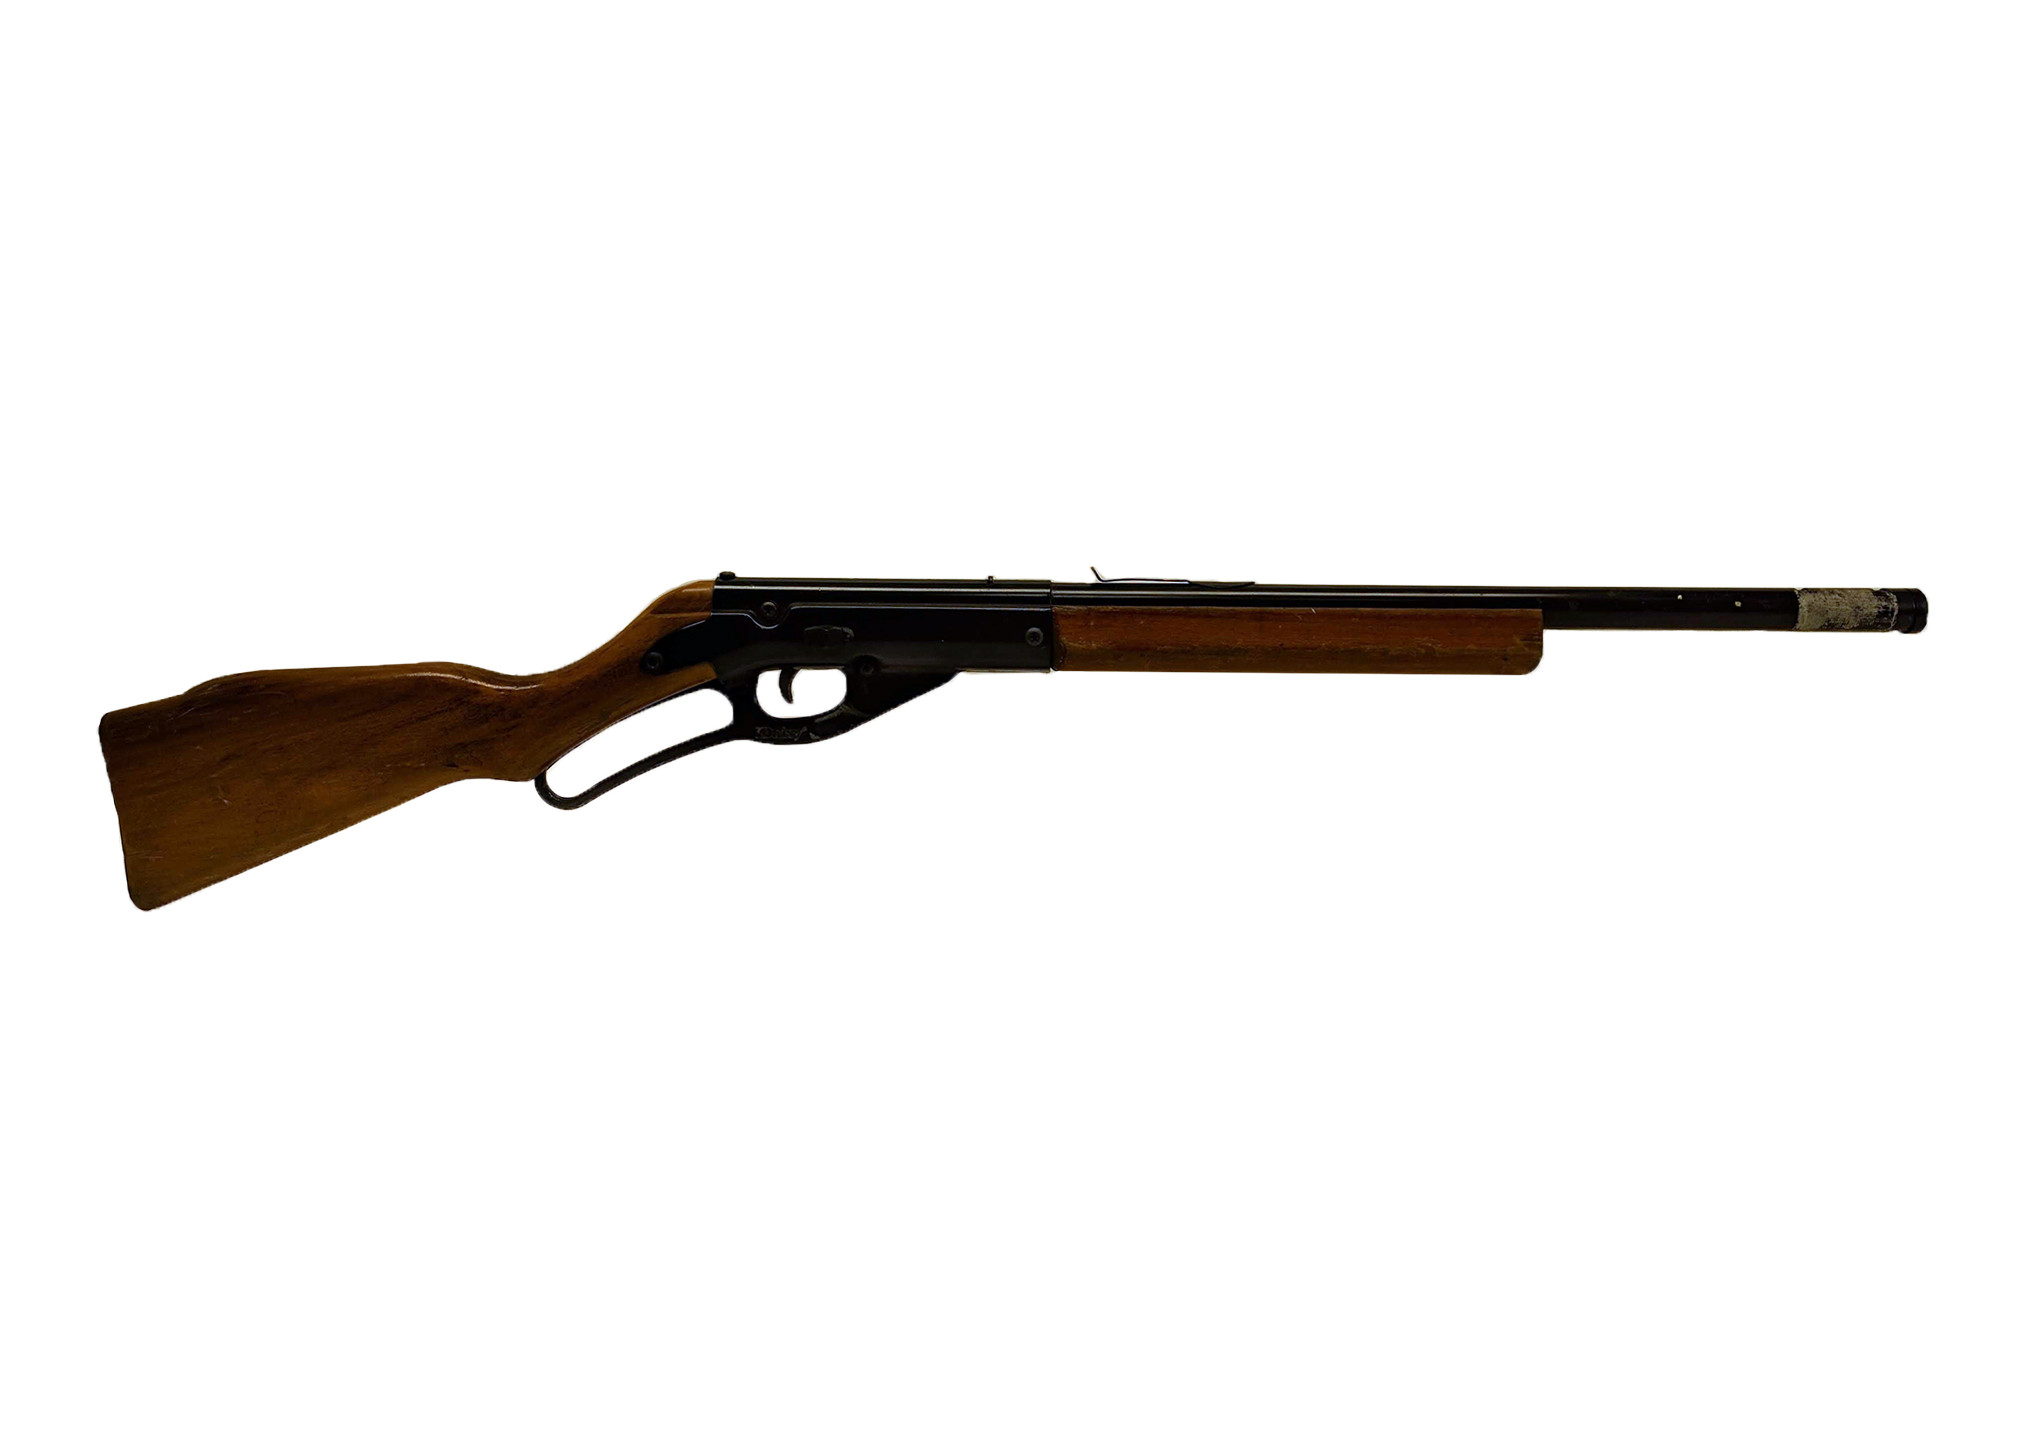 Daisy 98 BB gun